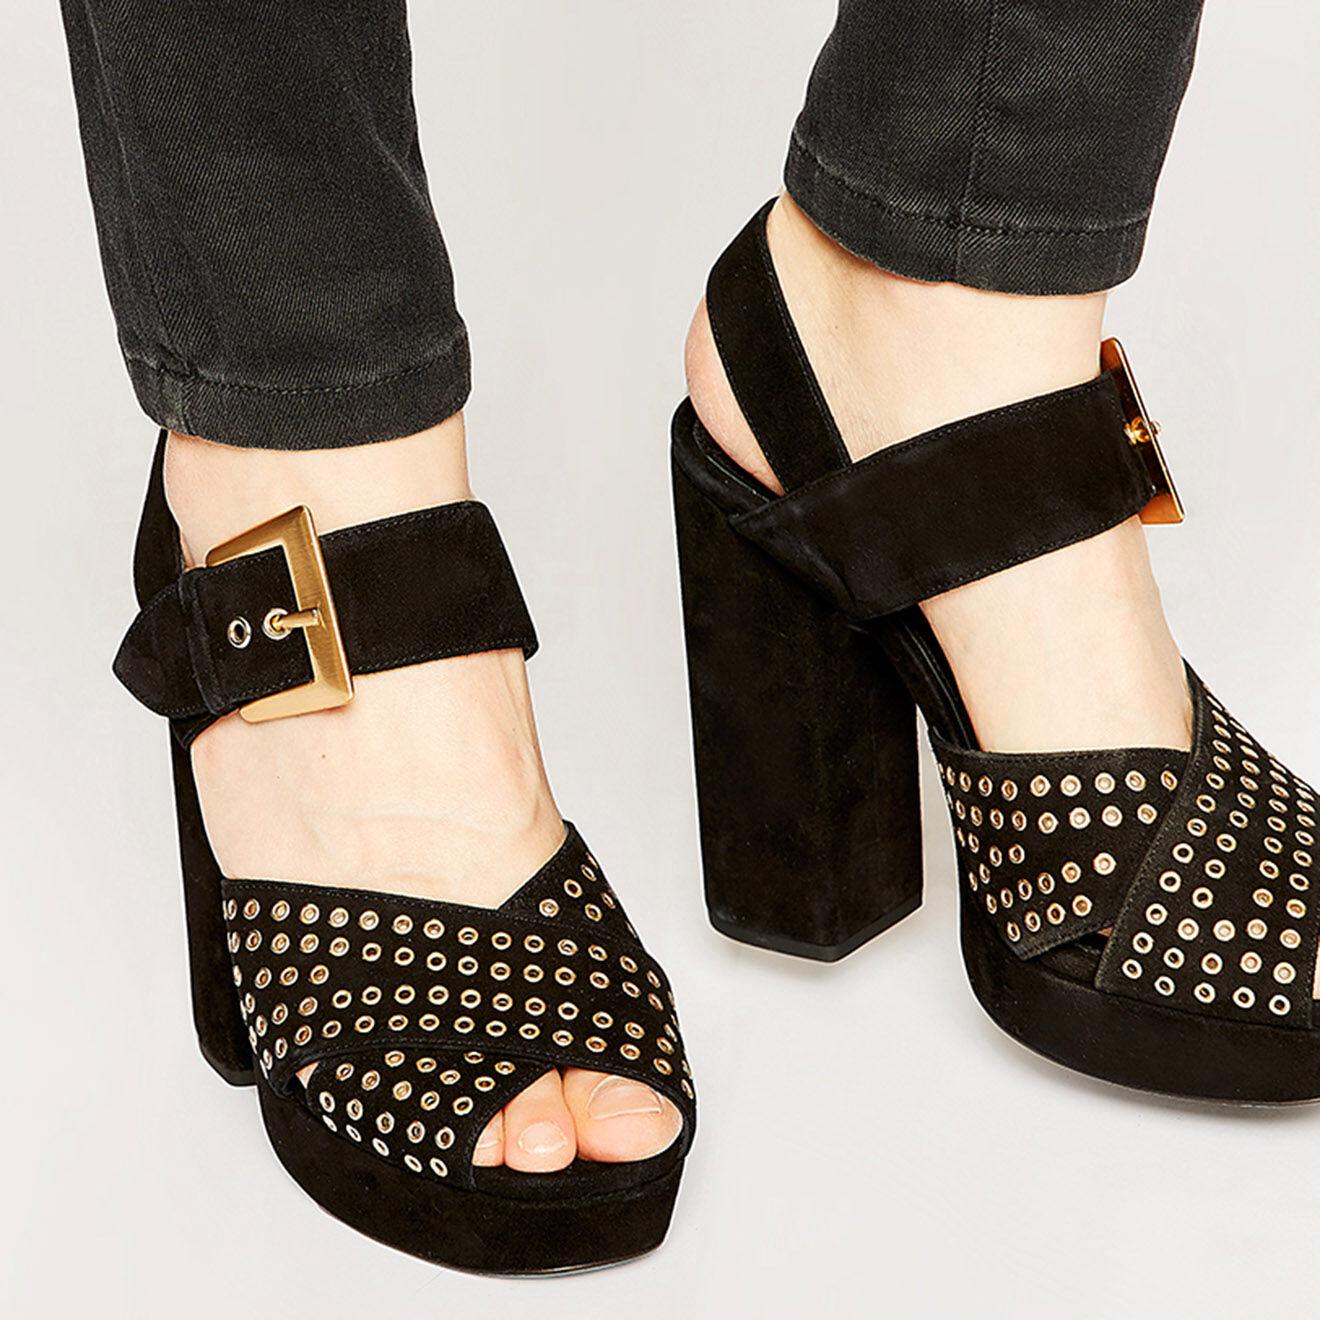 Sandales plateforme en Velours de Cuir & oeillets noires - The Kooples - Modalova